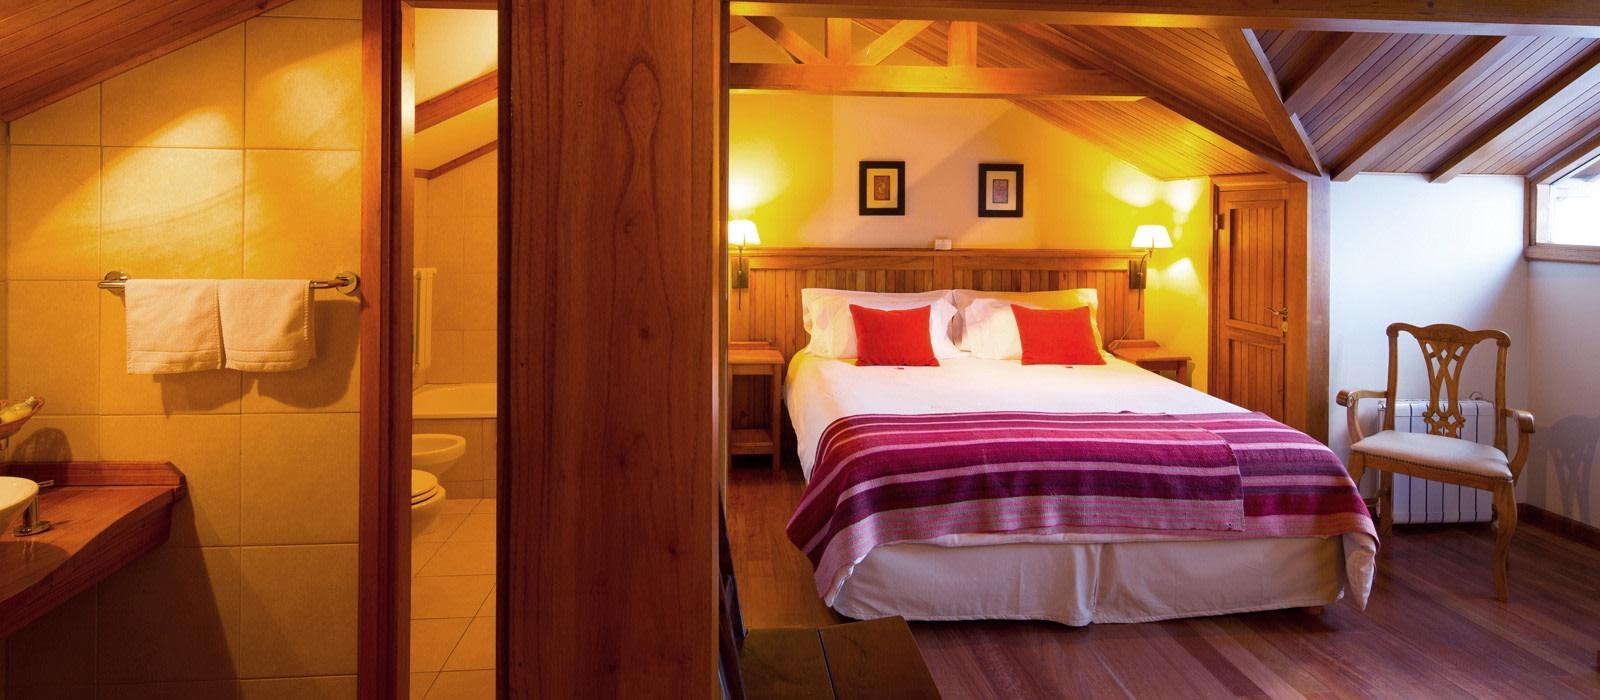 Hotel Hosteria Senderos Argentinien